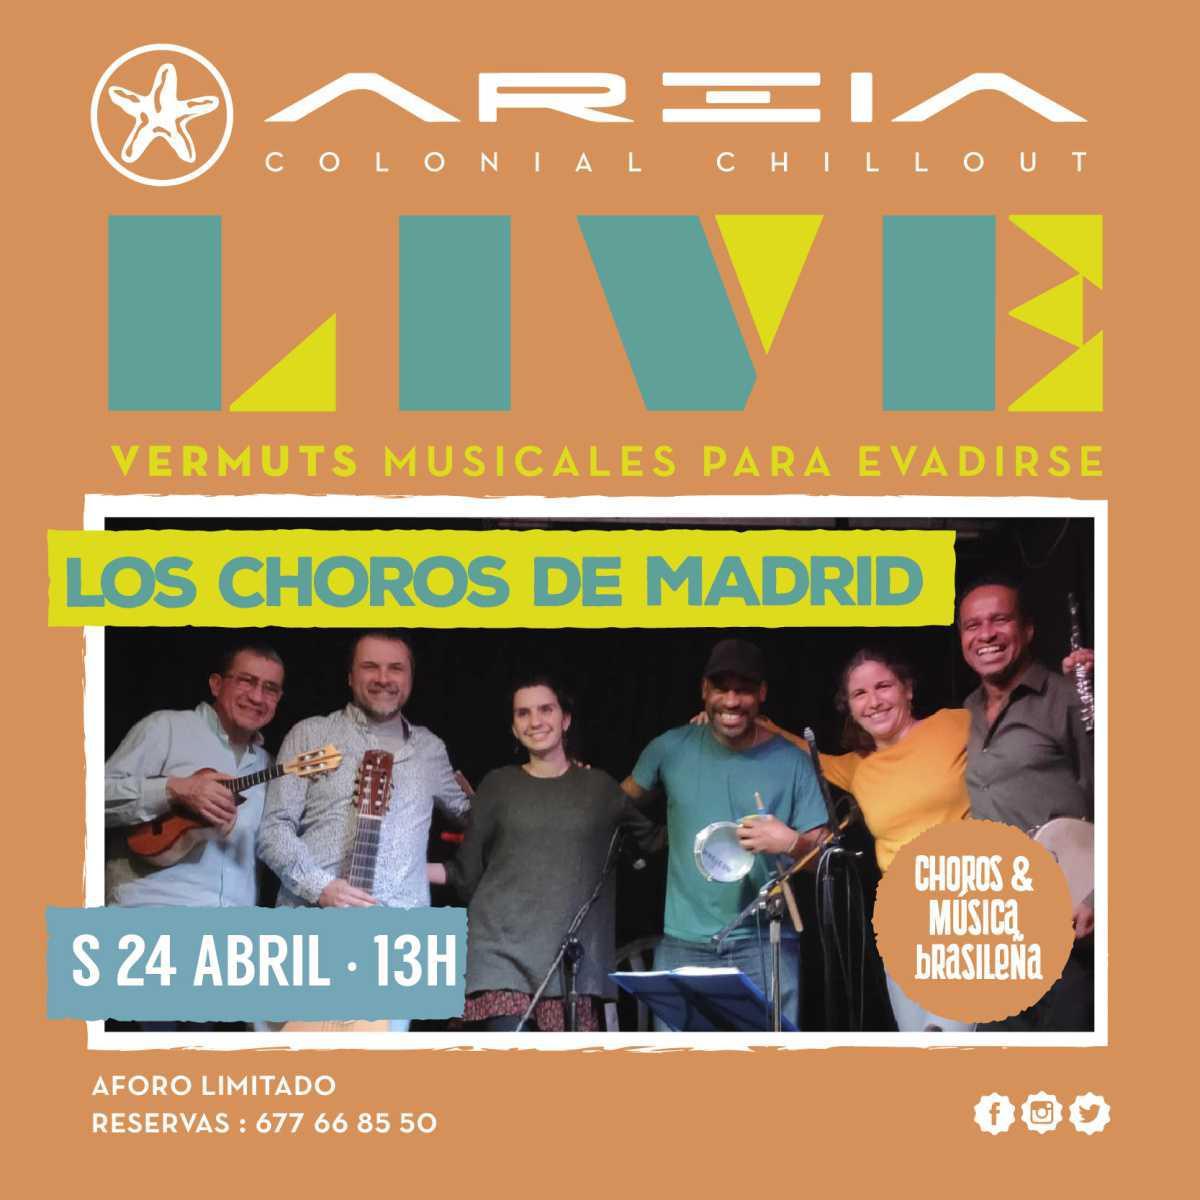 Areia Live presenta LOS CHOROS DE MADRID – choros & música brasileña